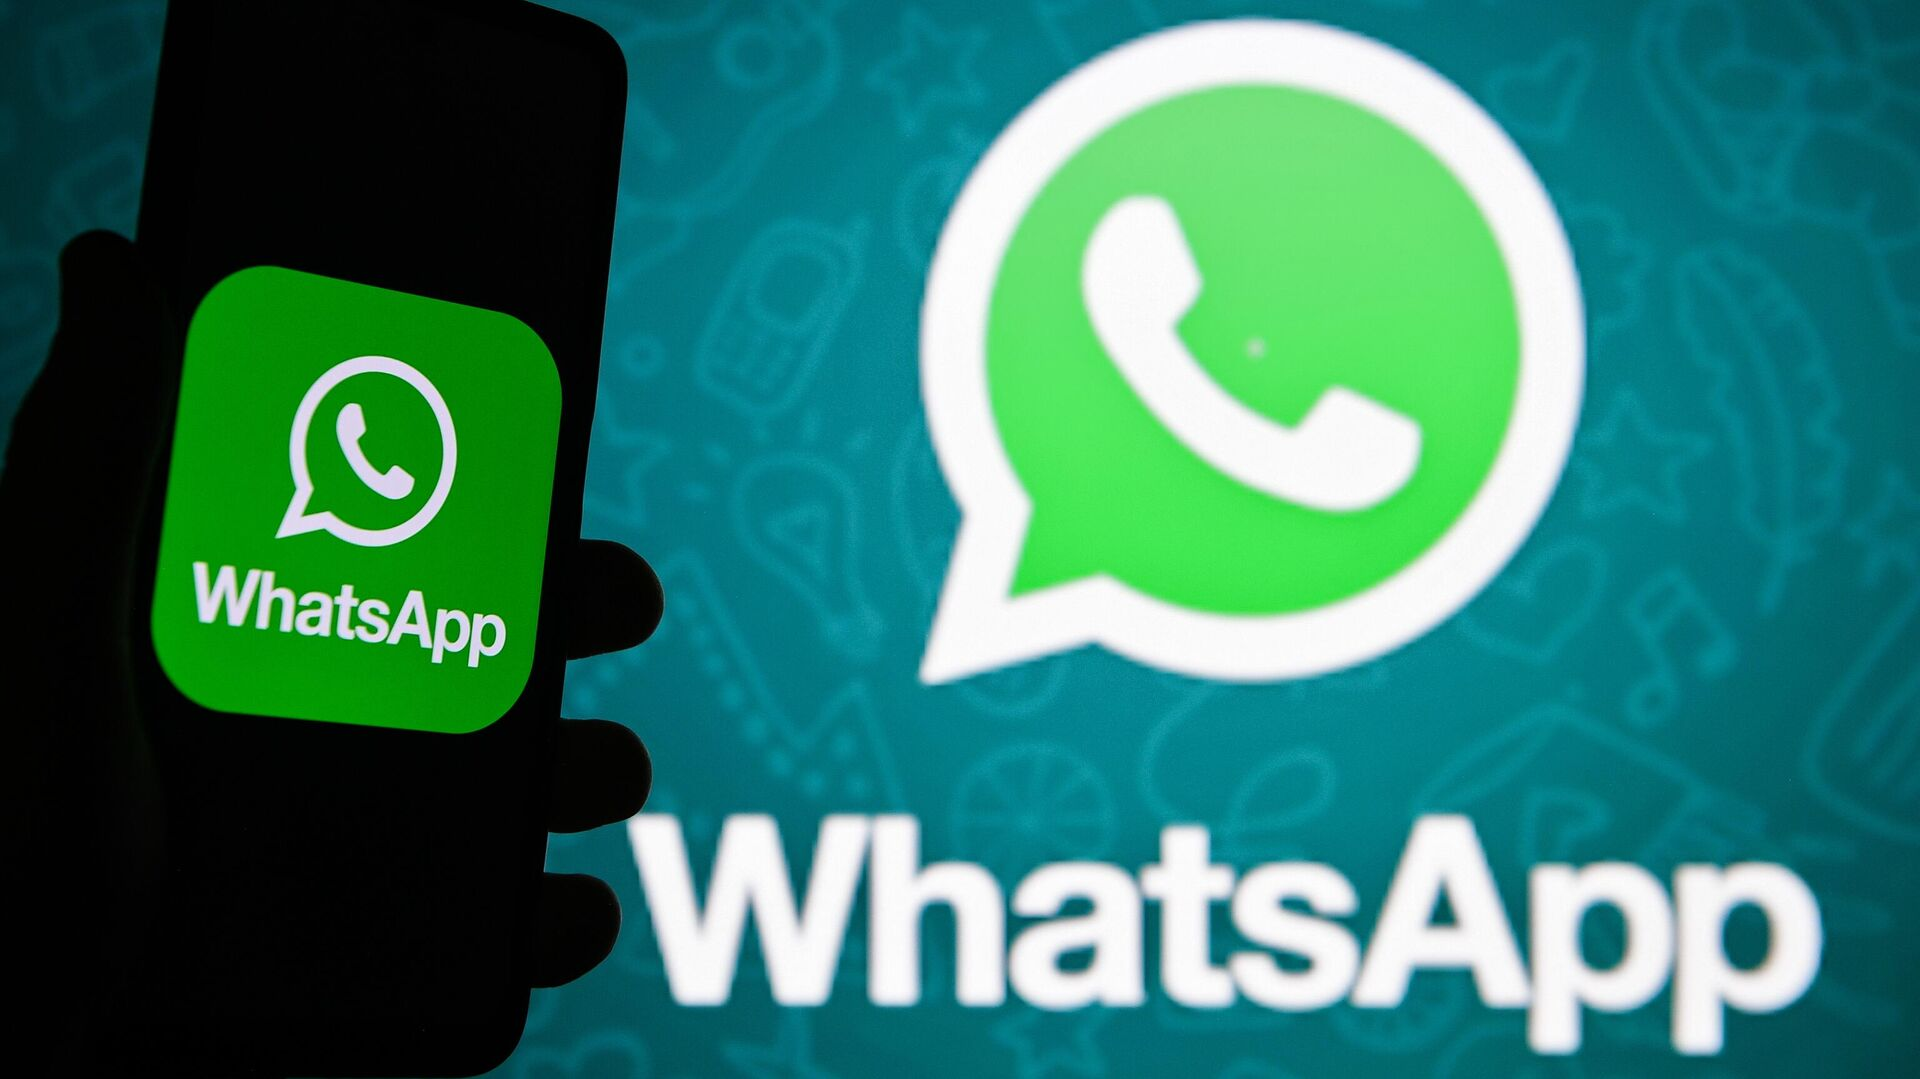 Логотип мессенджера WhatsApp - РИА Новости, 1920, 09.03.2021